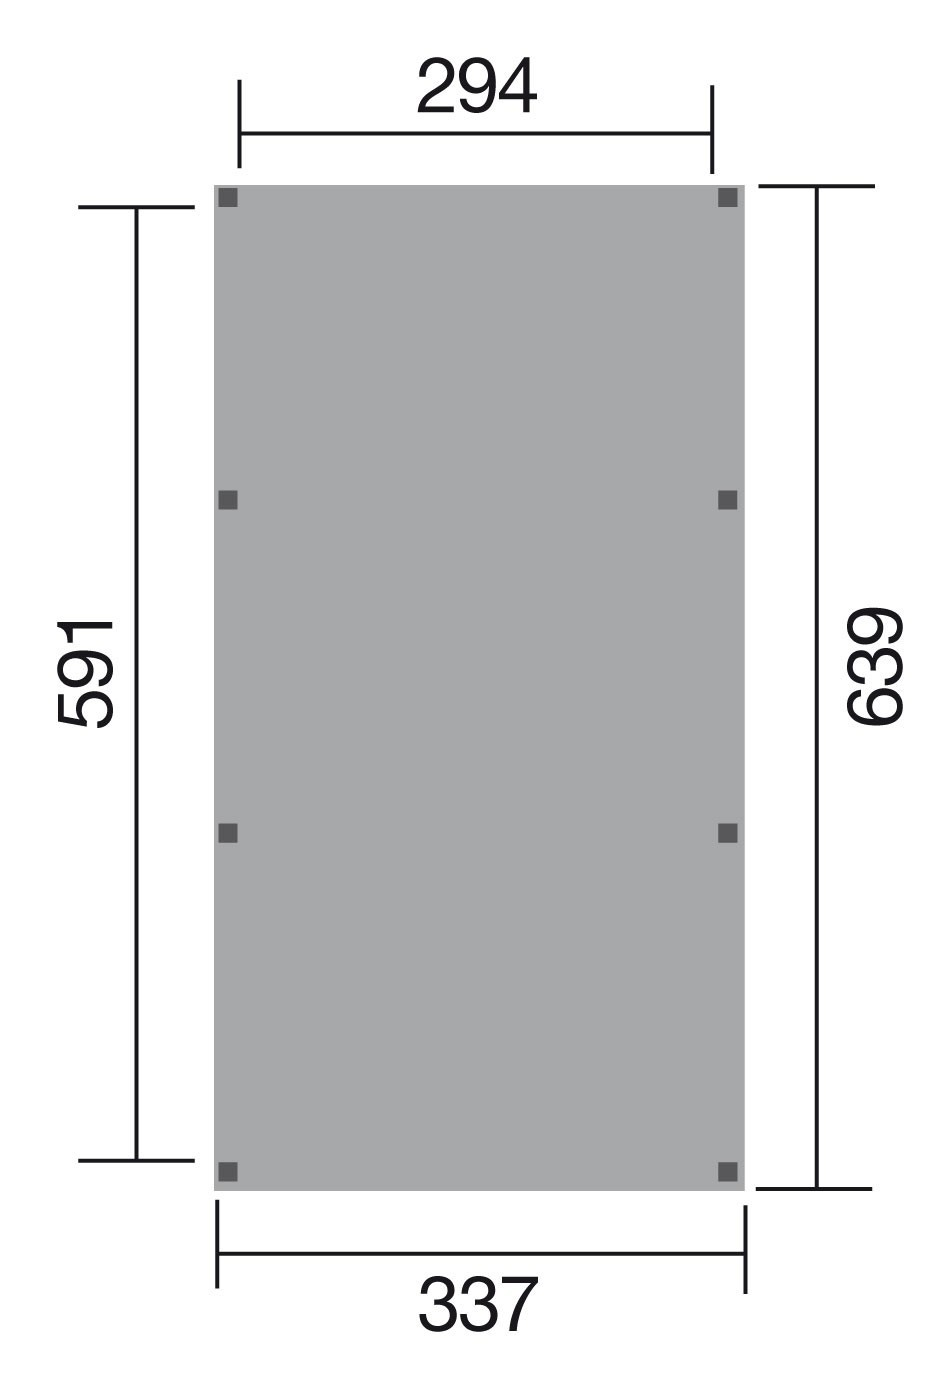 WEKA Carport / Einzelcarport Leimholz 615 Gr.1 Flachdach 337x639cm Bild 2